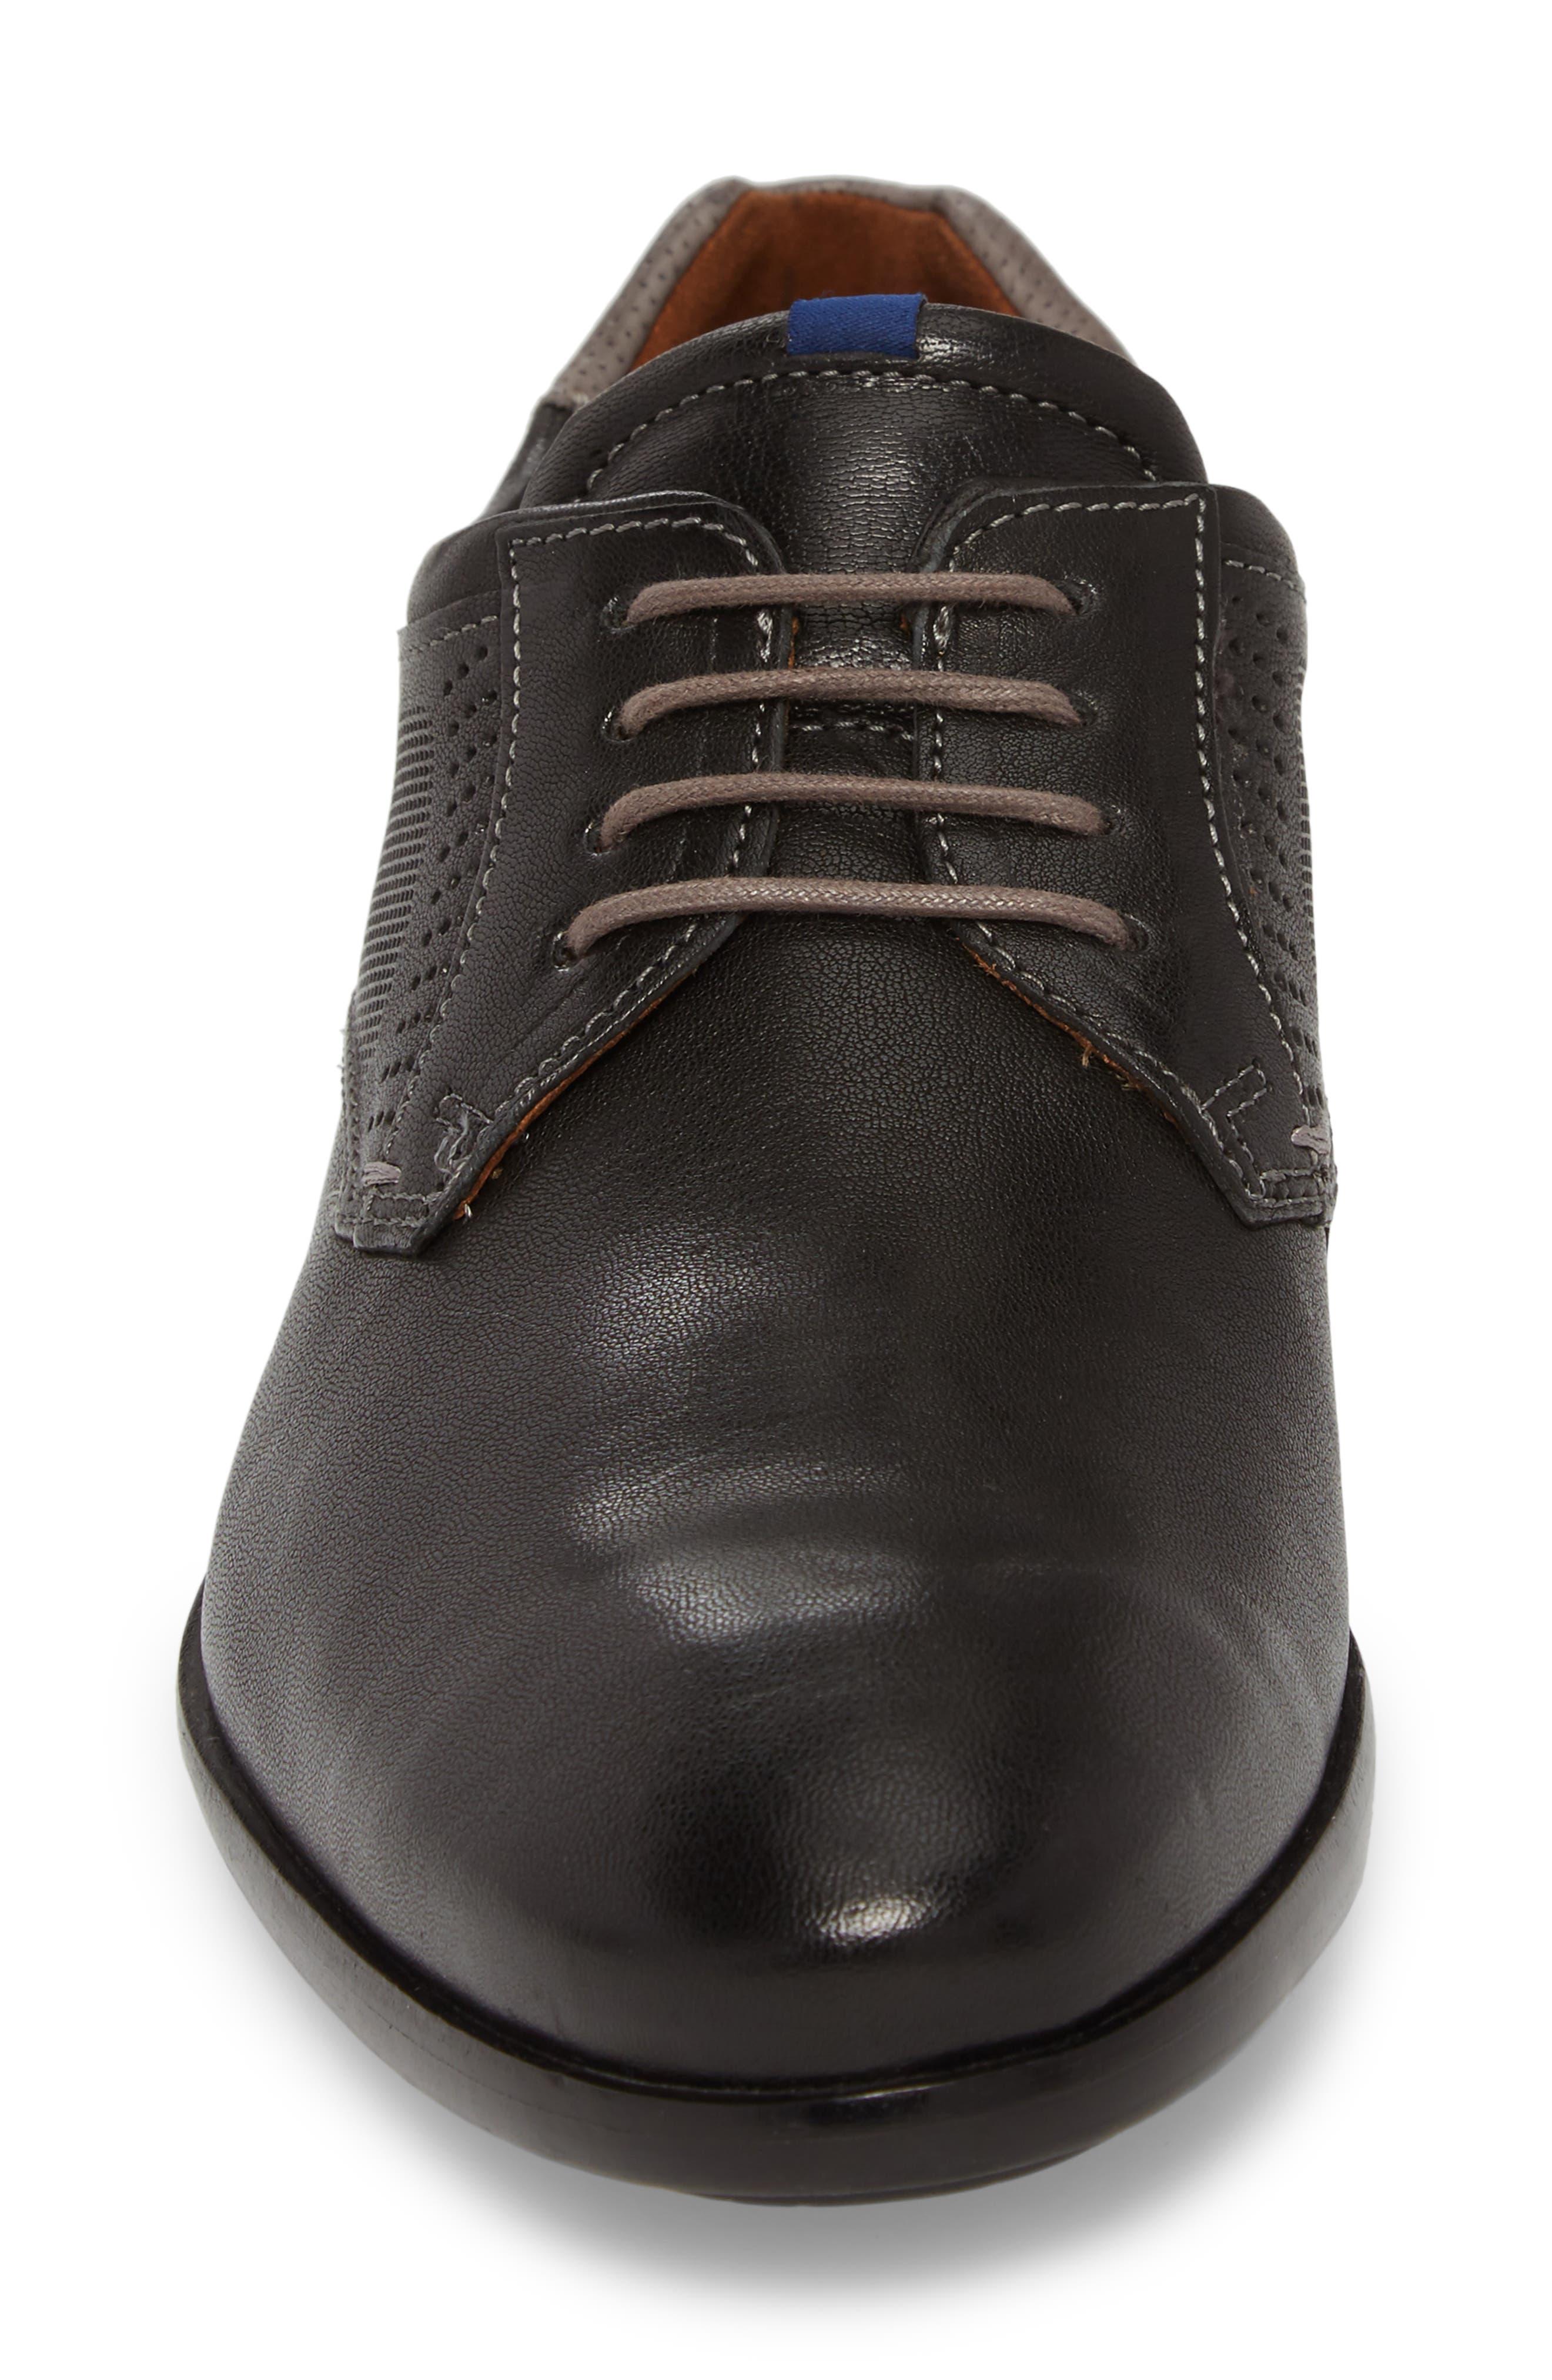 Morice Plain Toe Derby,                             Alternate thumbnail 4, color,                             BLACK/ GREY LEATHER